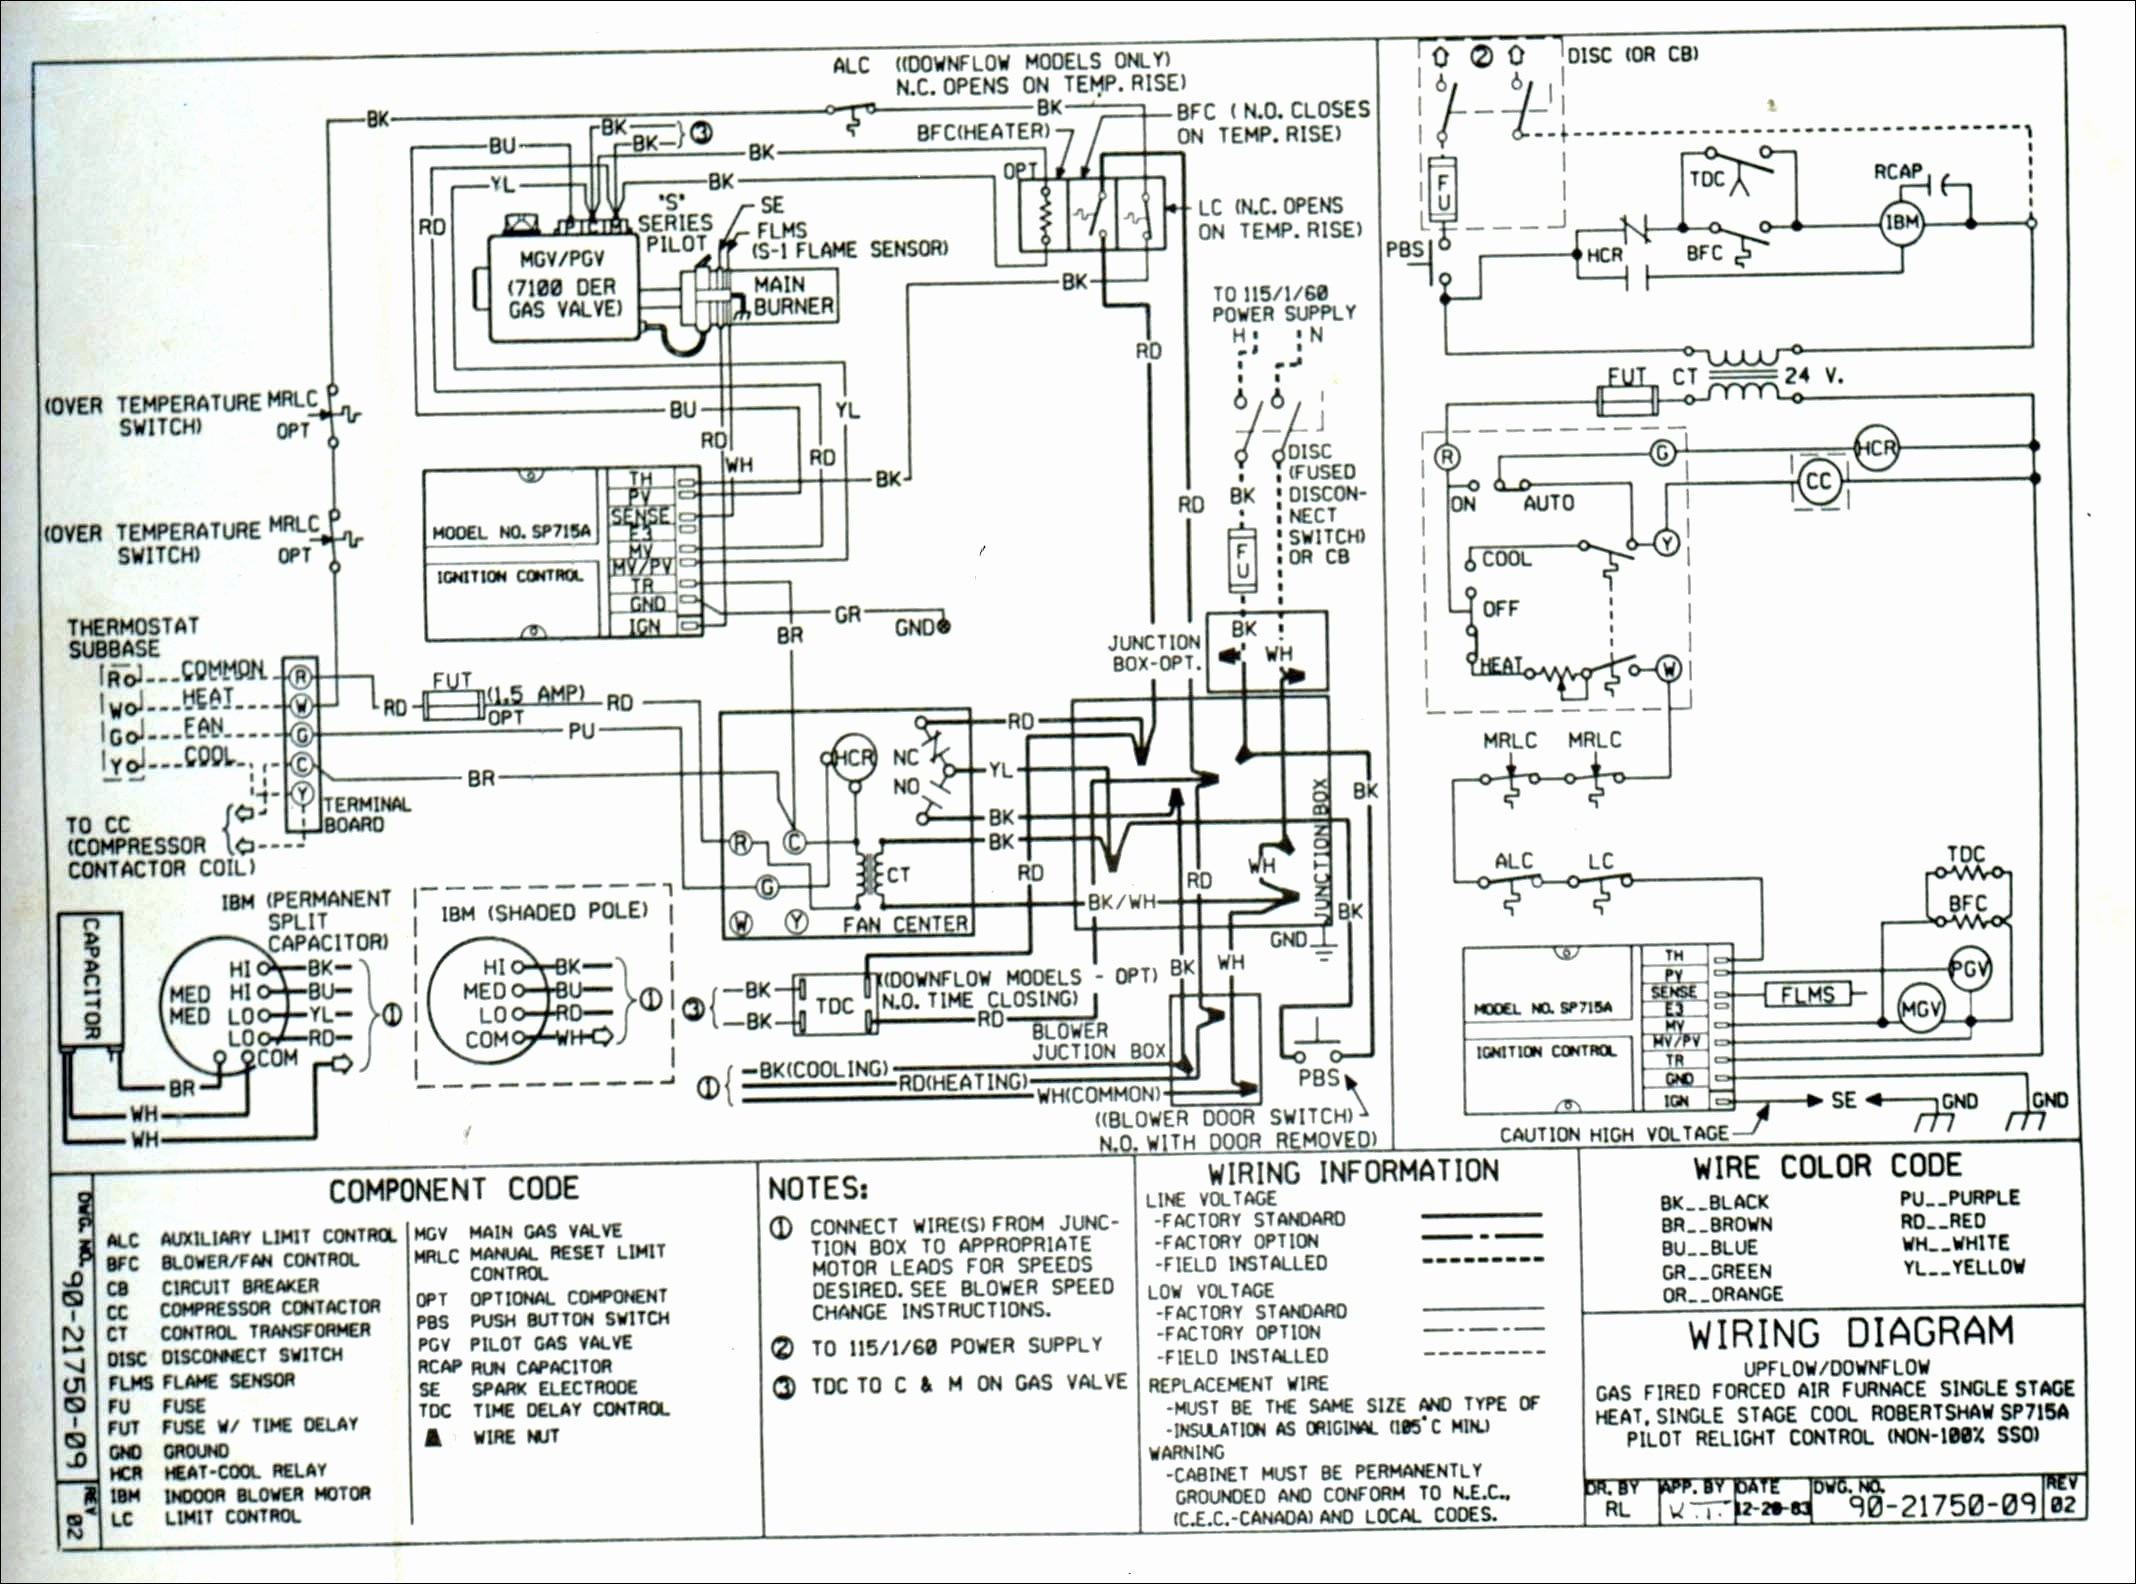 Metra Wiring Harness Diagram 70 1817   Best Wiring Library - Metra 70-1761 Wiring Diagram